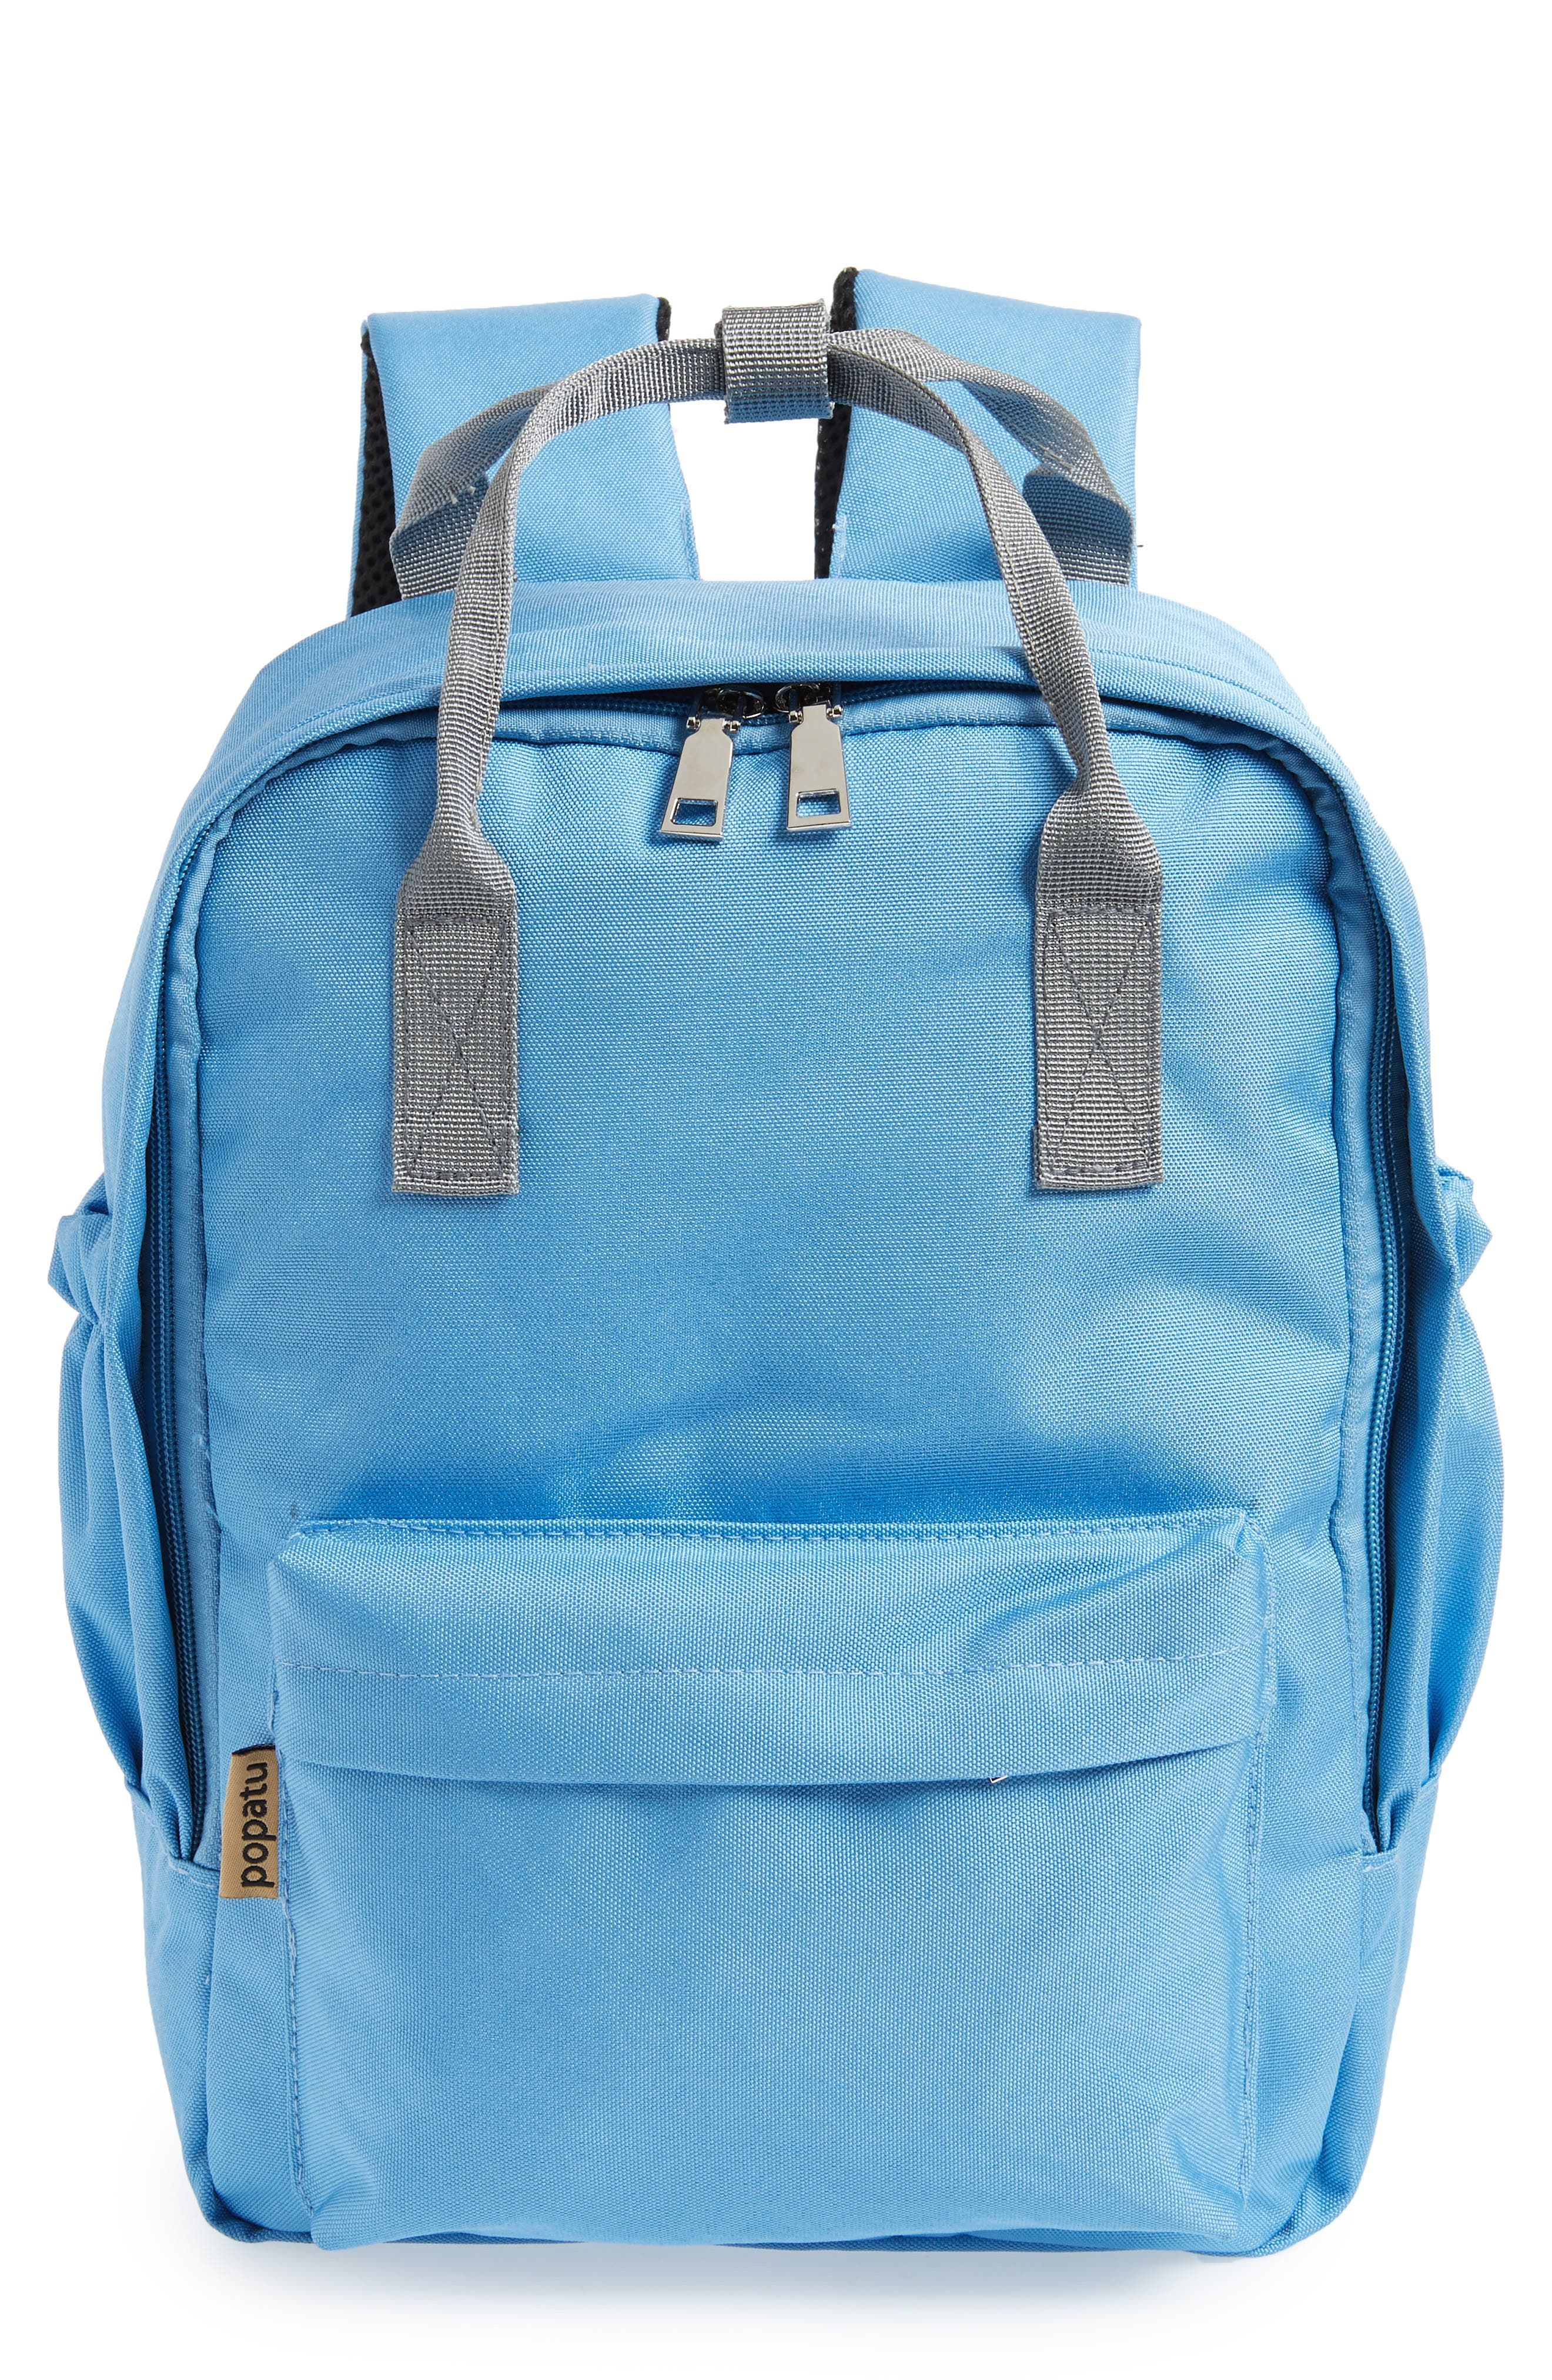 Solid Backpack,                         Main,                         color, Light Blue/ Grey